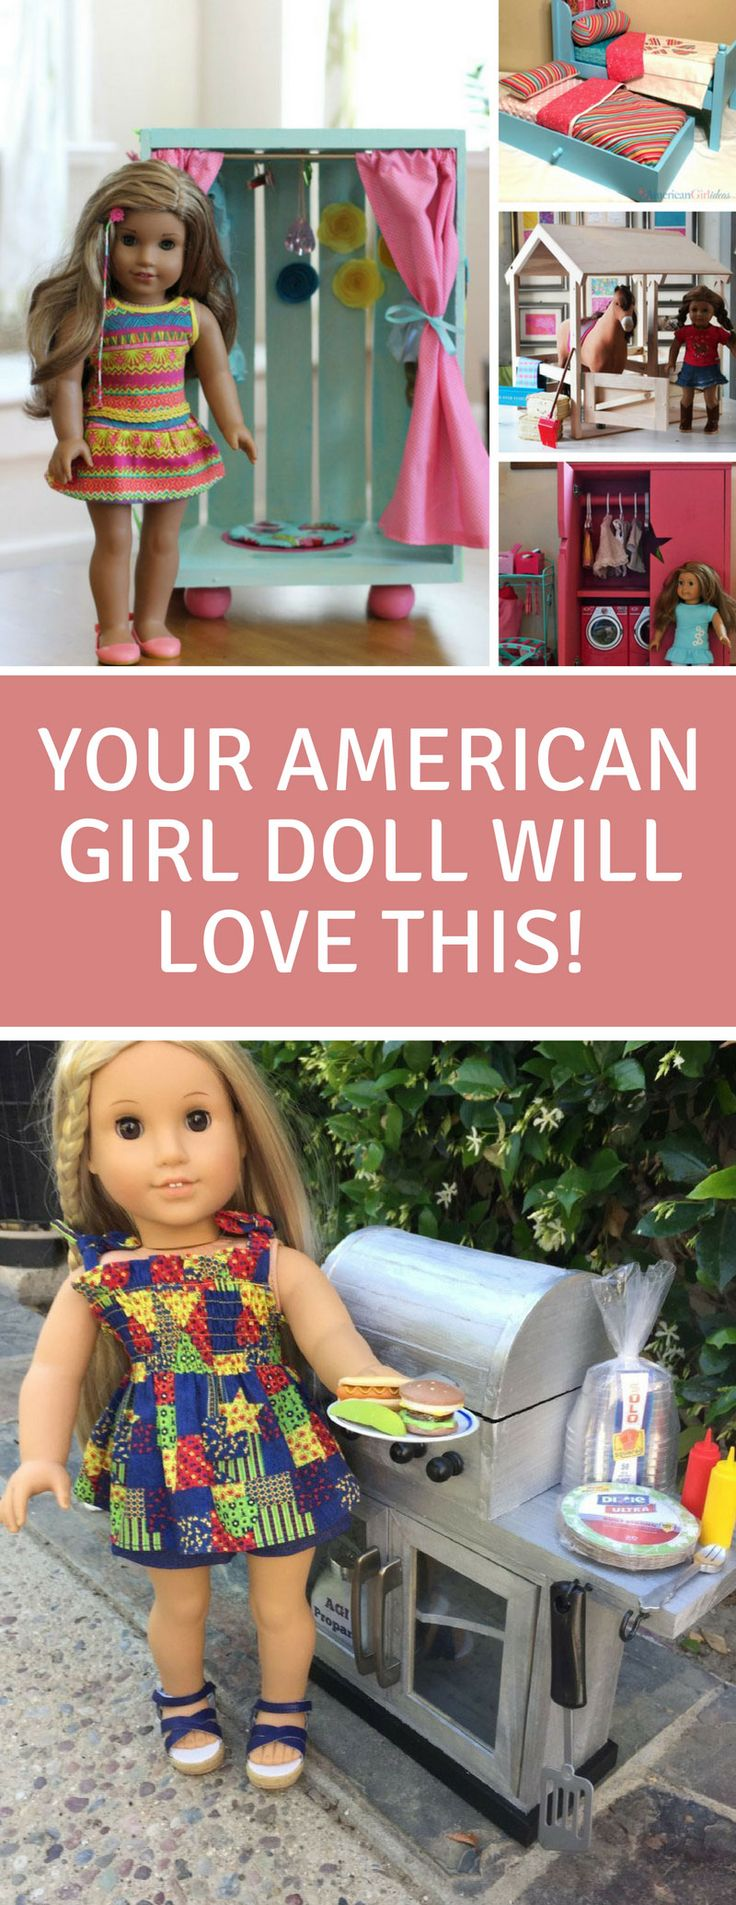 Doll Girl American Free American Dvd HD Porn Video 7f